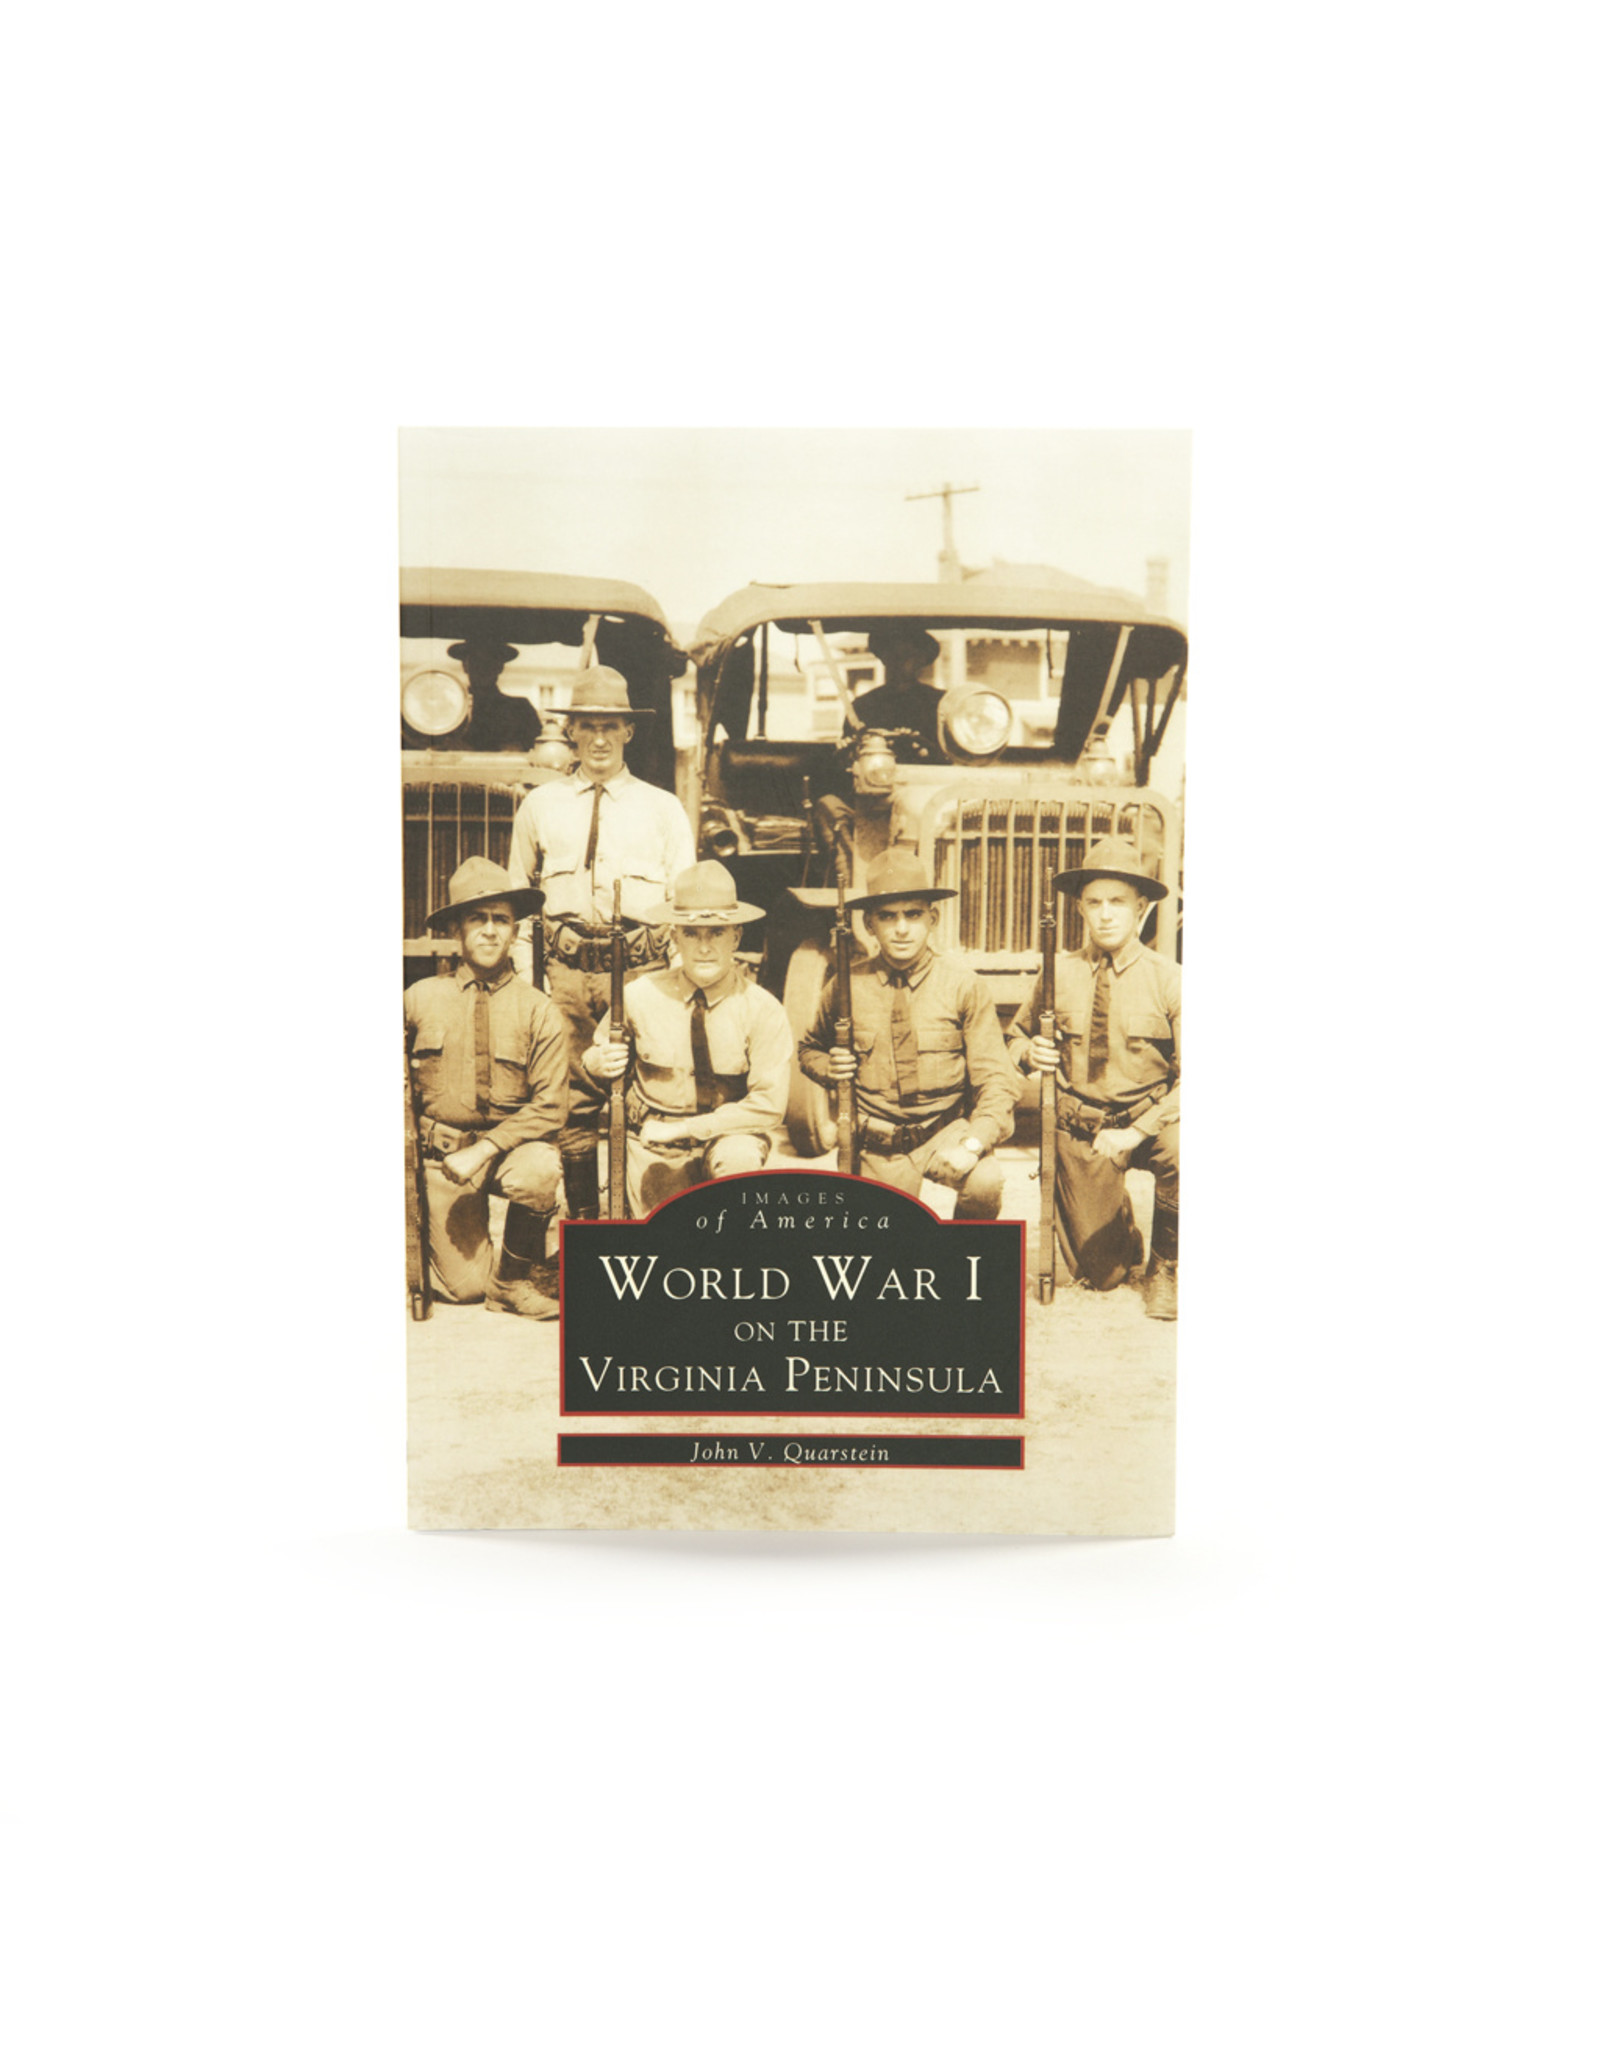 World War One on the Virginia Peninsula